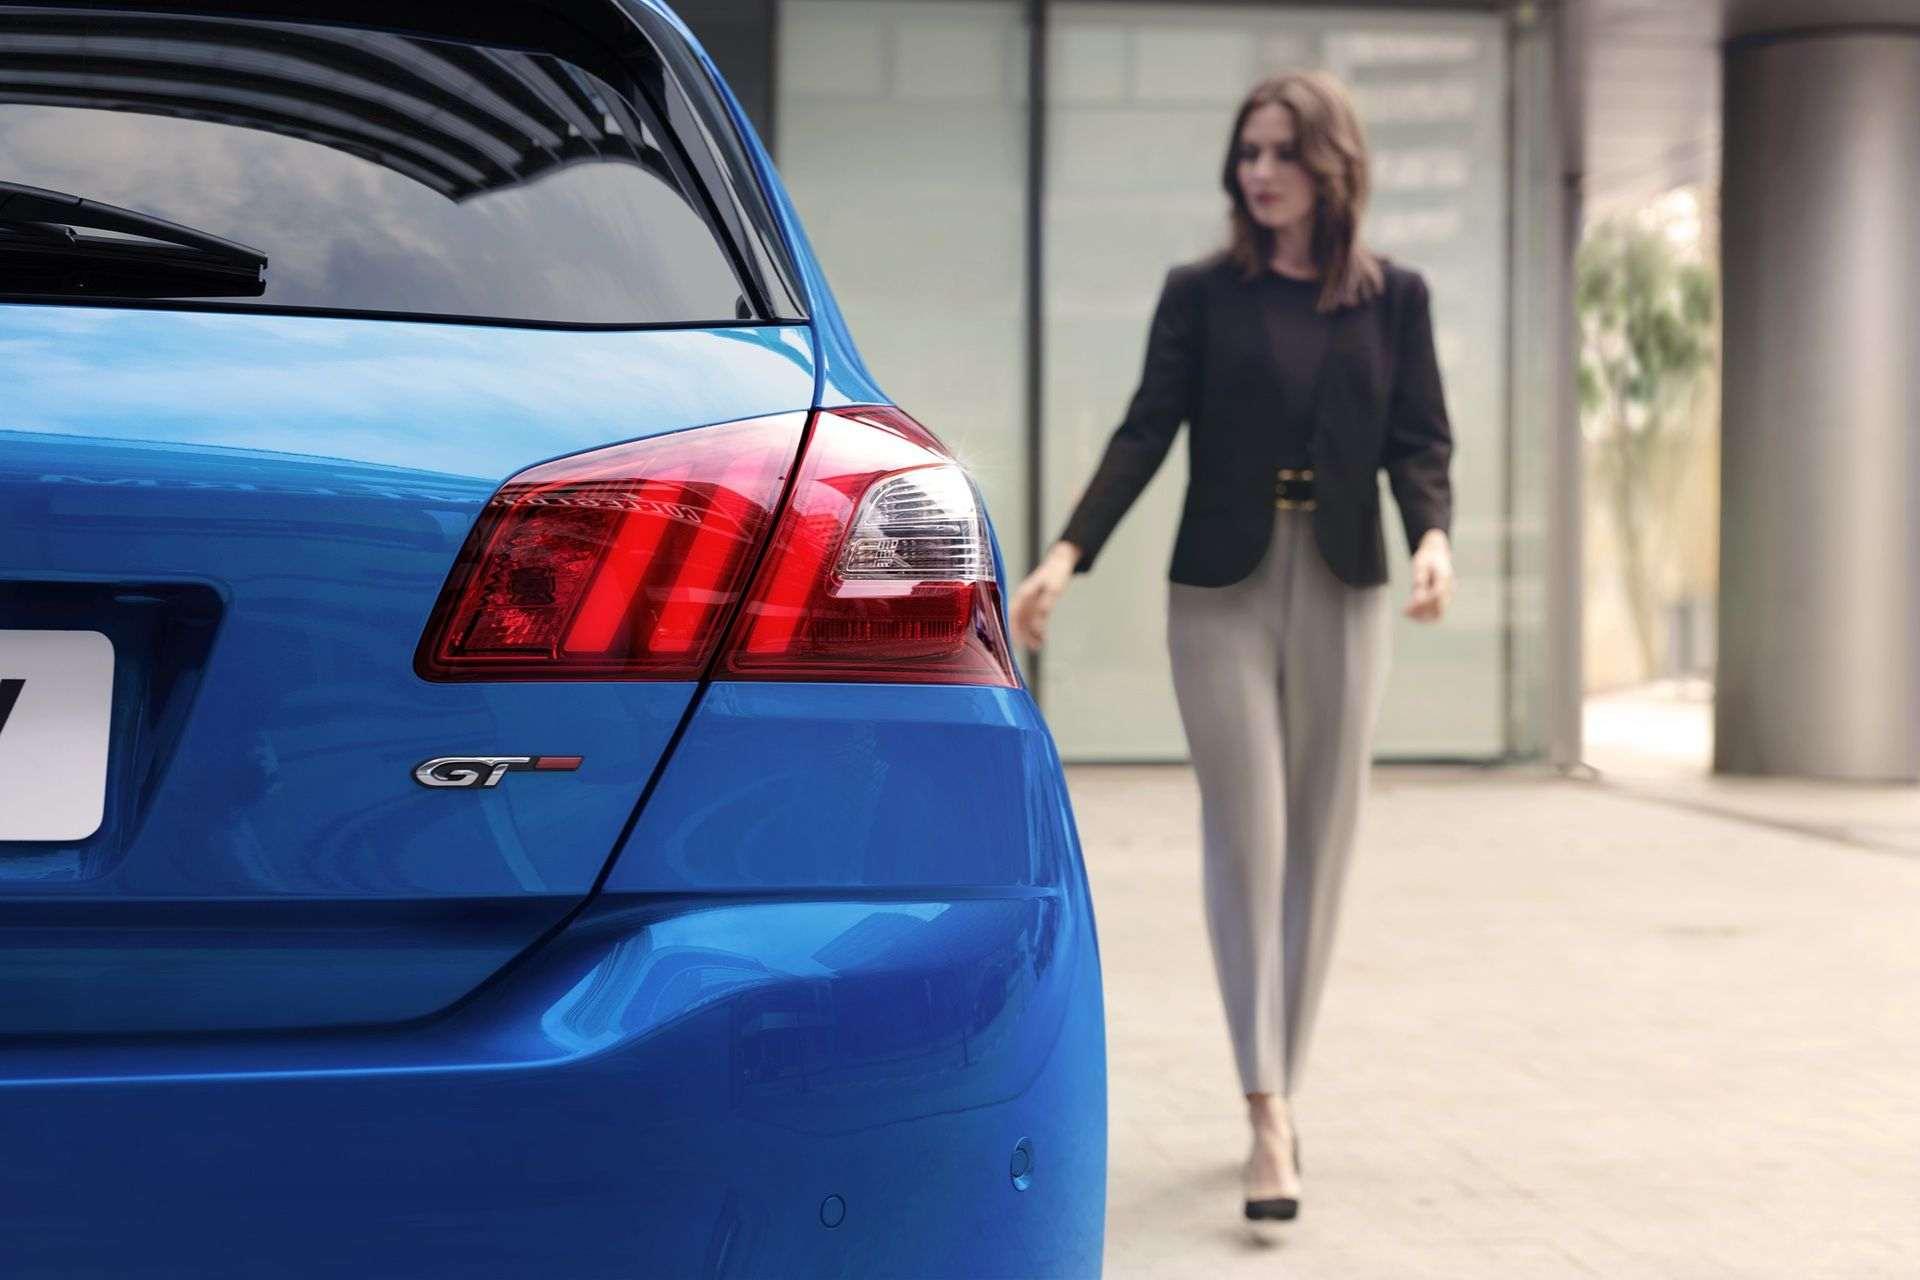 2020_Peugeot_308_facelift_0012